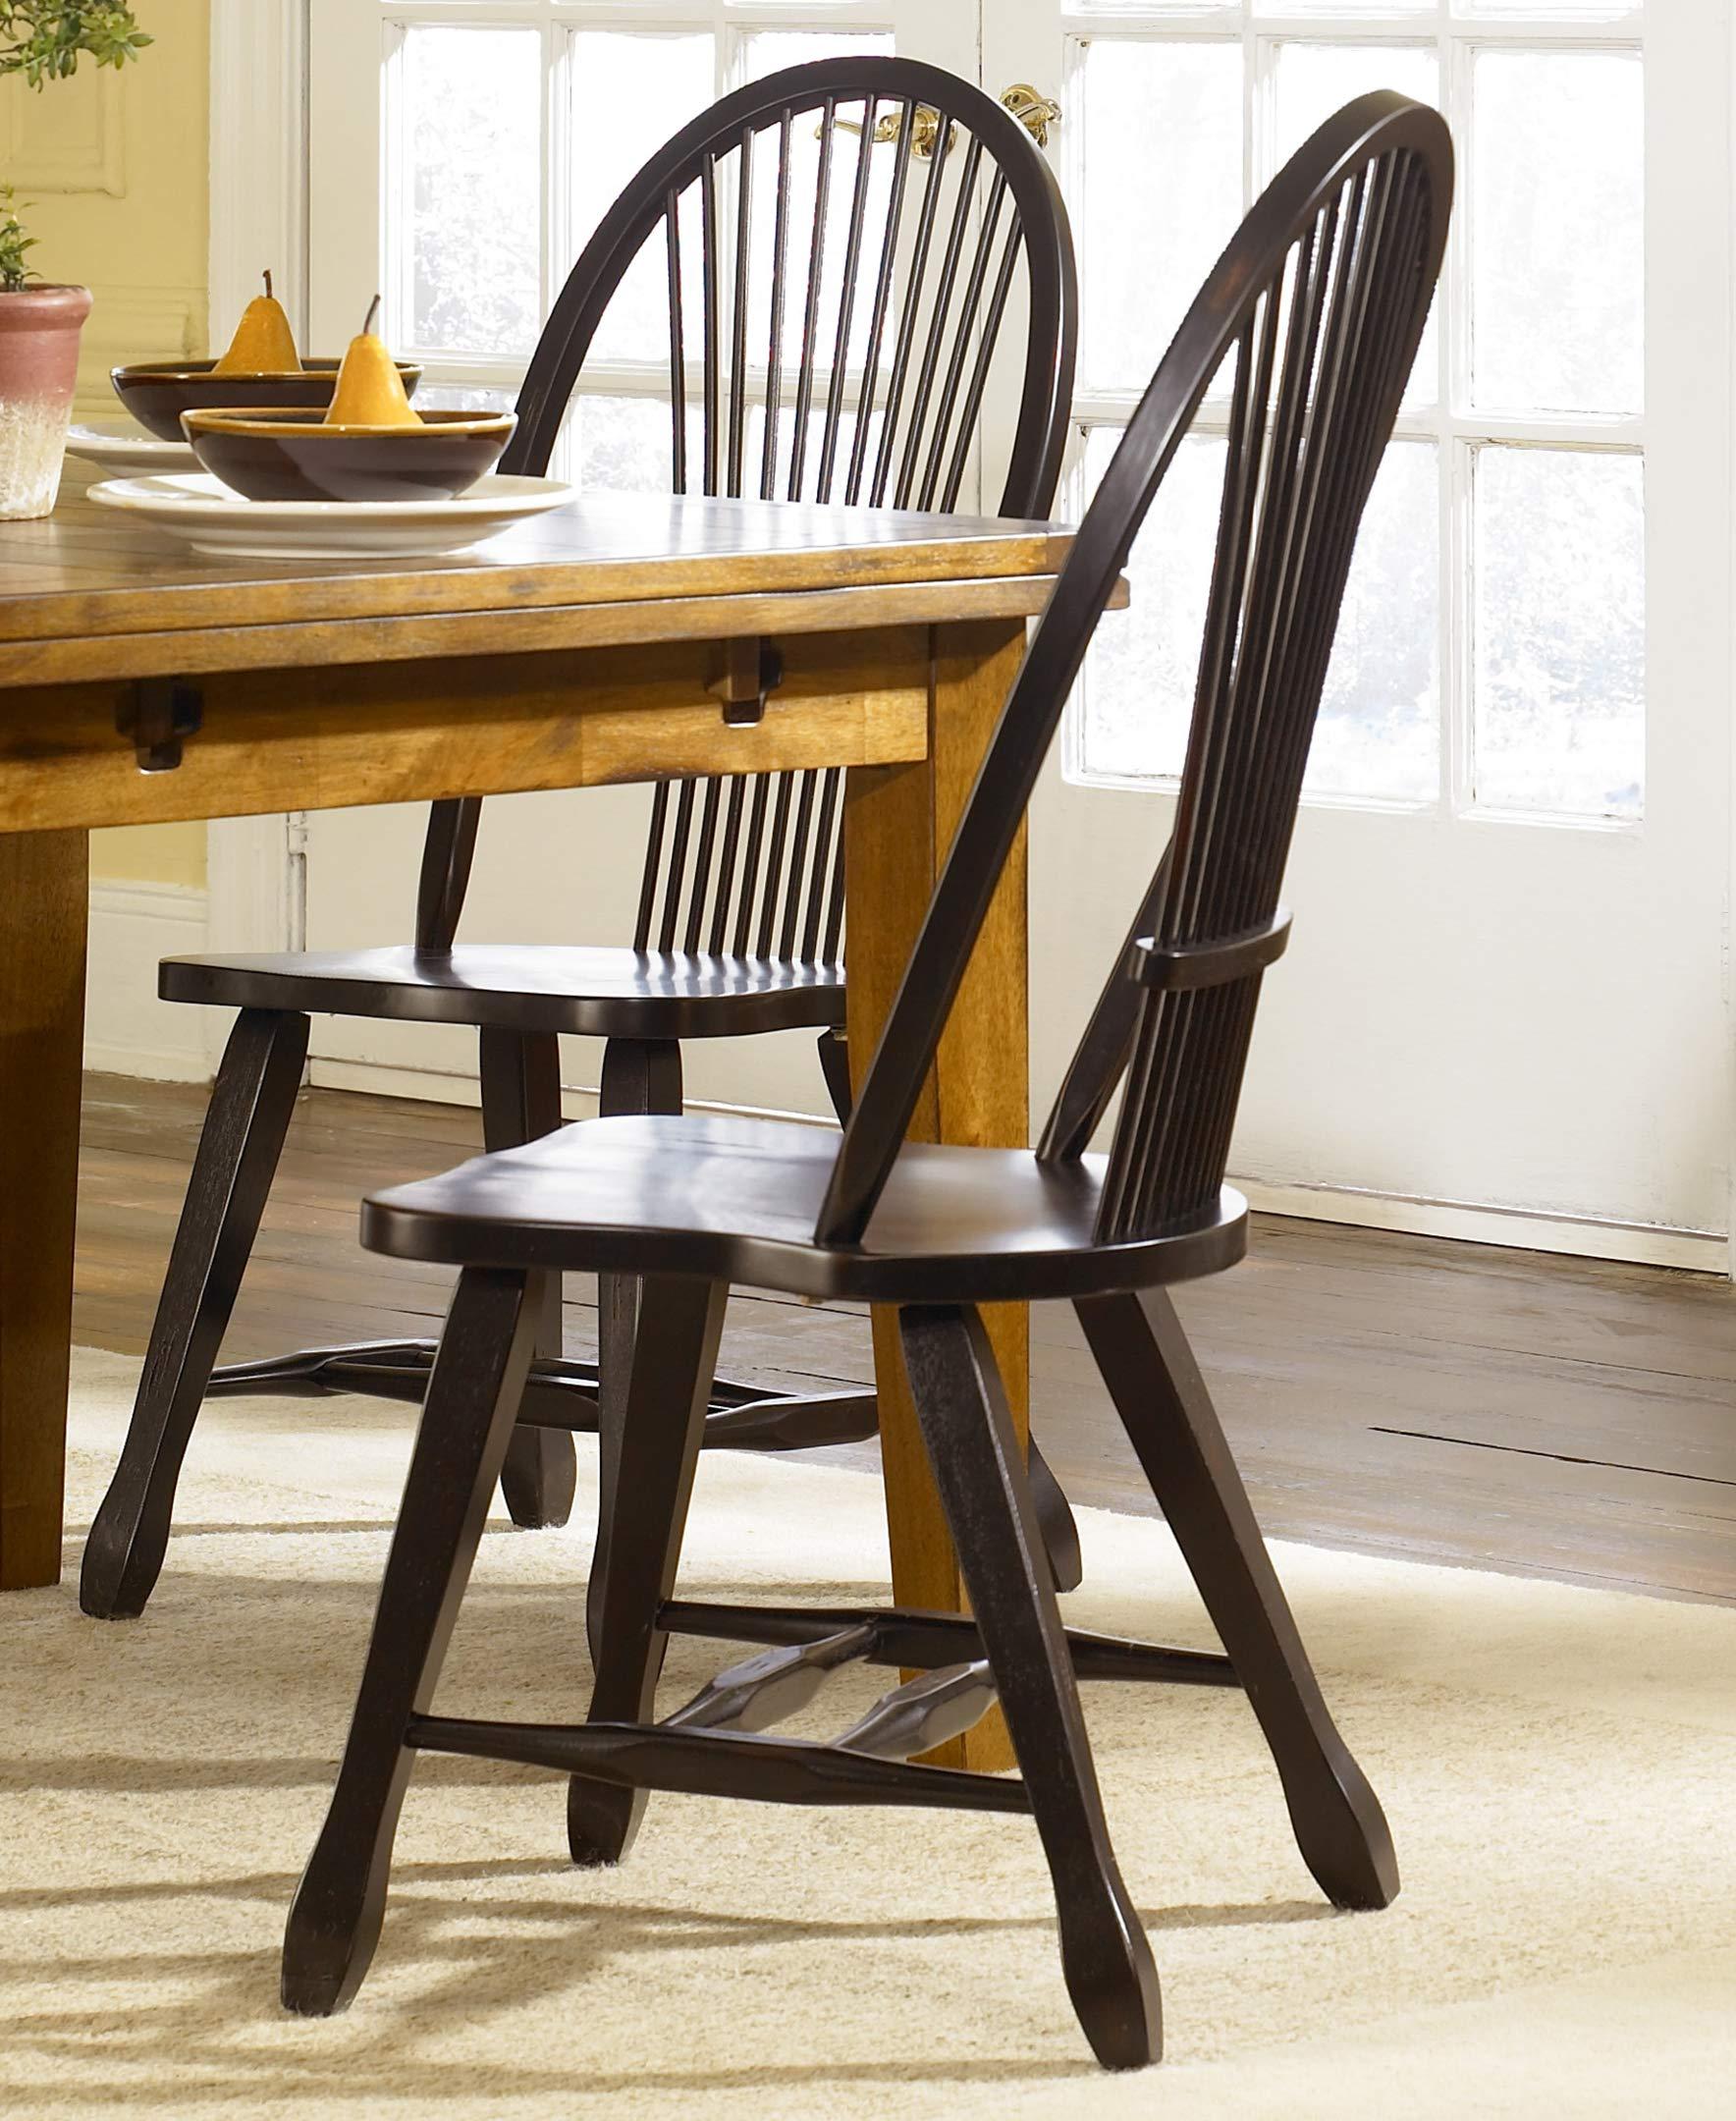 Liberty Furniture Industries Treasures Sheaf Back Side Chair - Black, W18 x D20 x H41, Medium Brown by Liberty Furniture INDUSTRIES